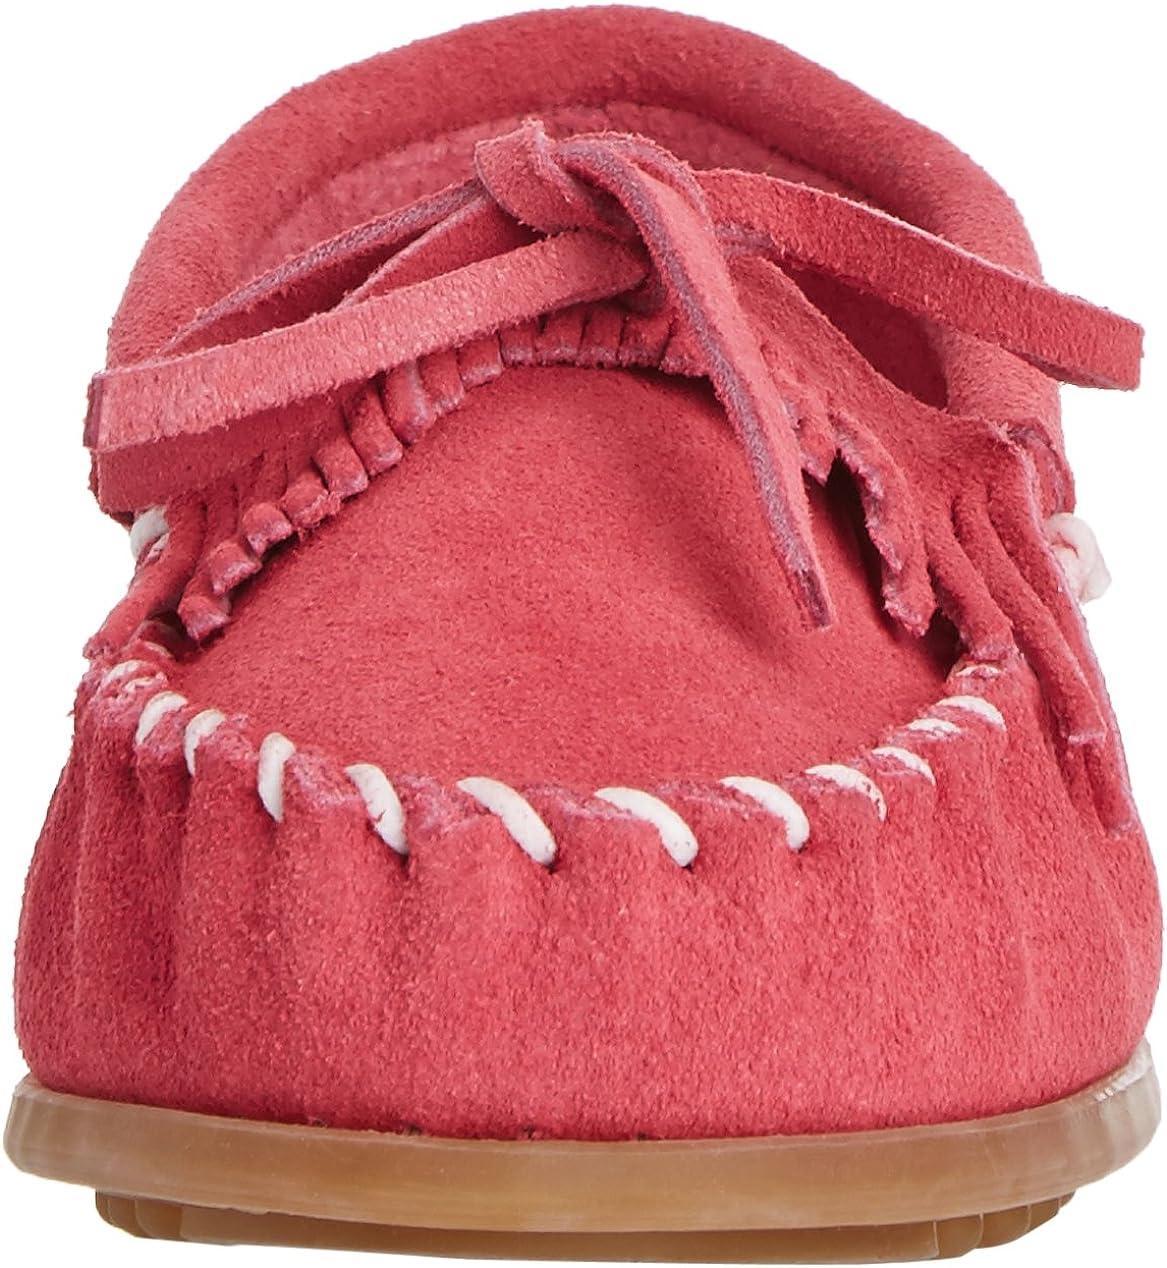 Minnetonka Unisex-Child Kilty Suede Moc Loafers